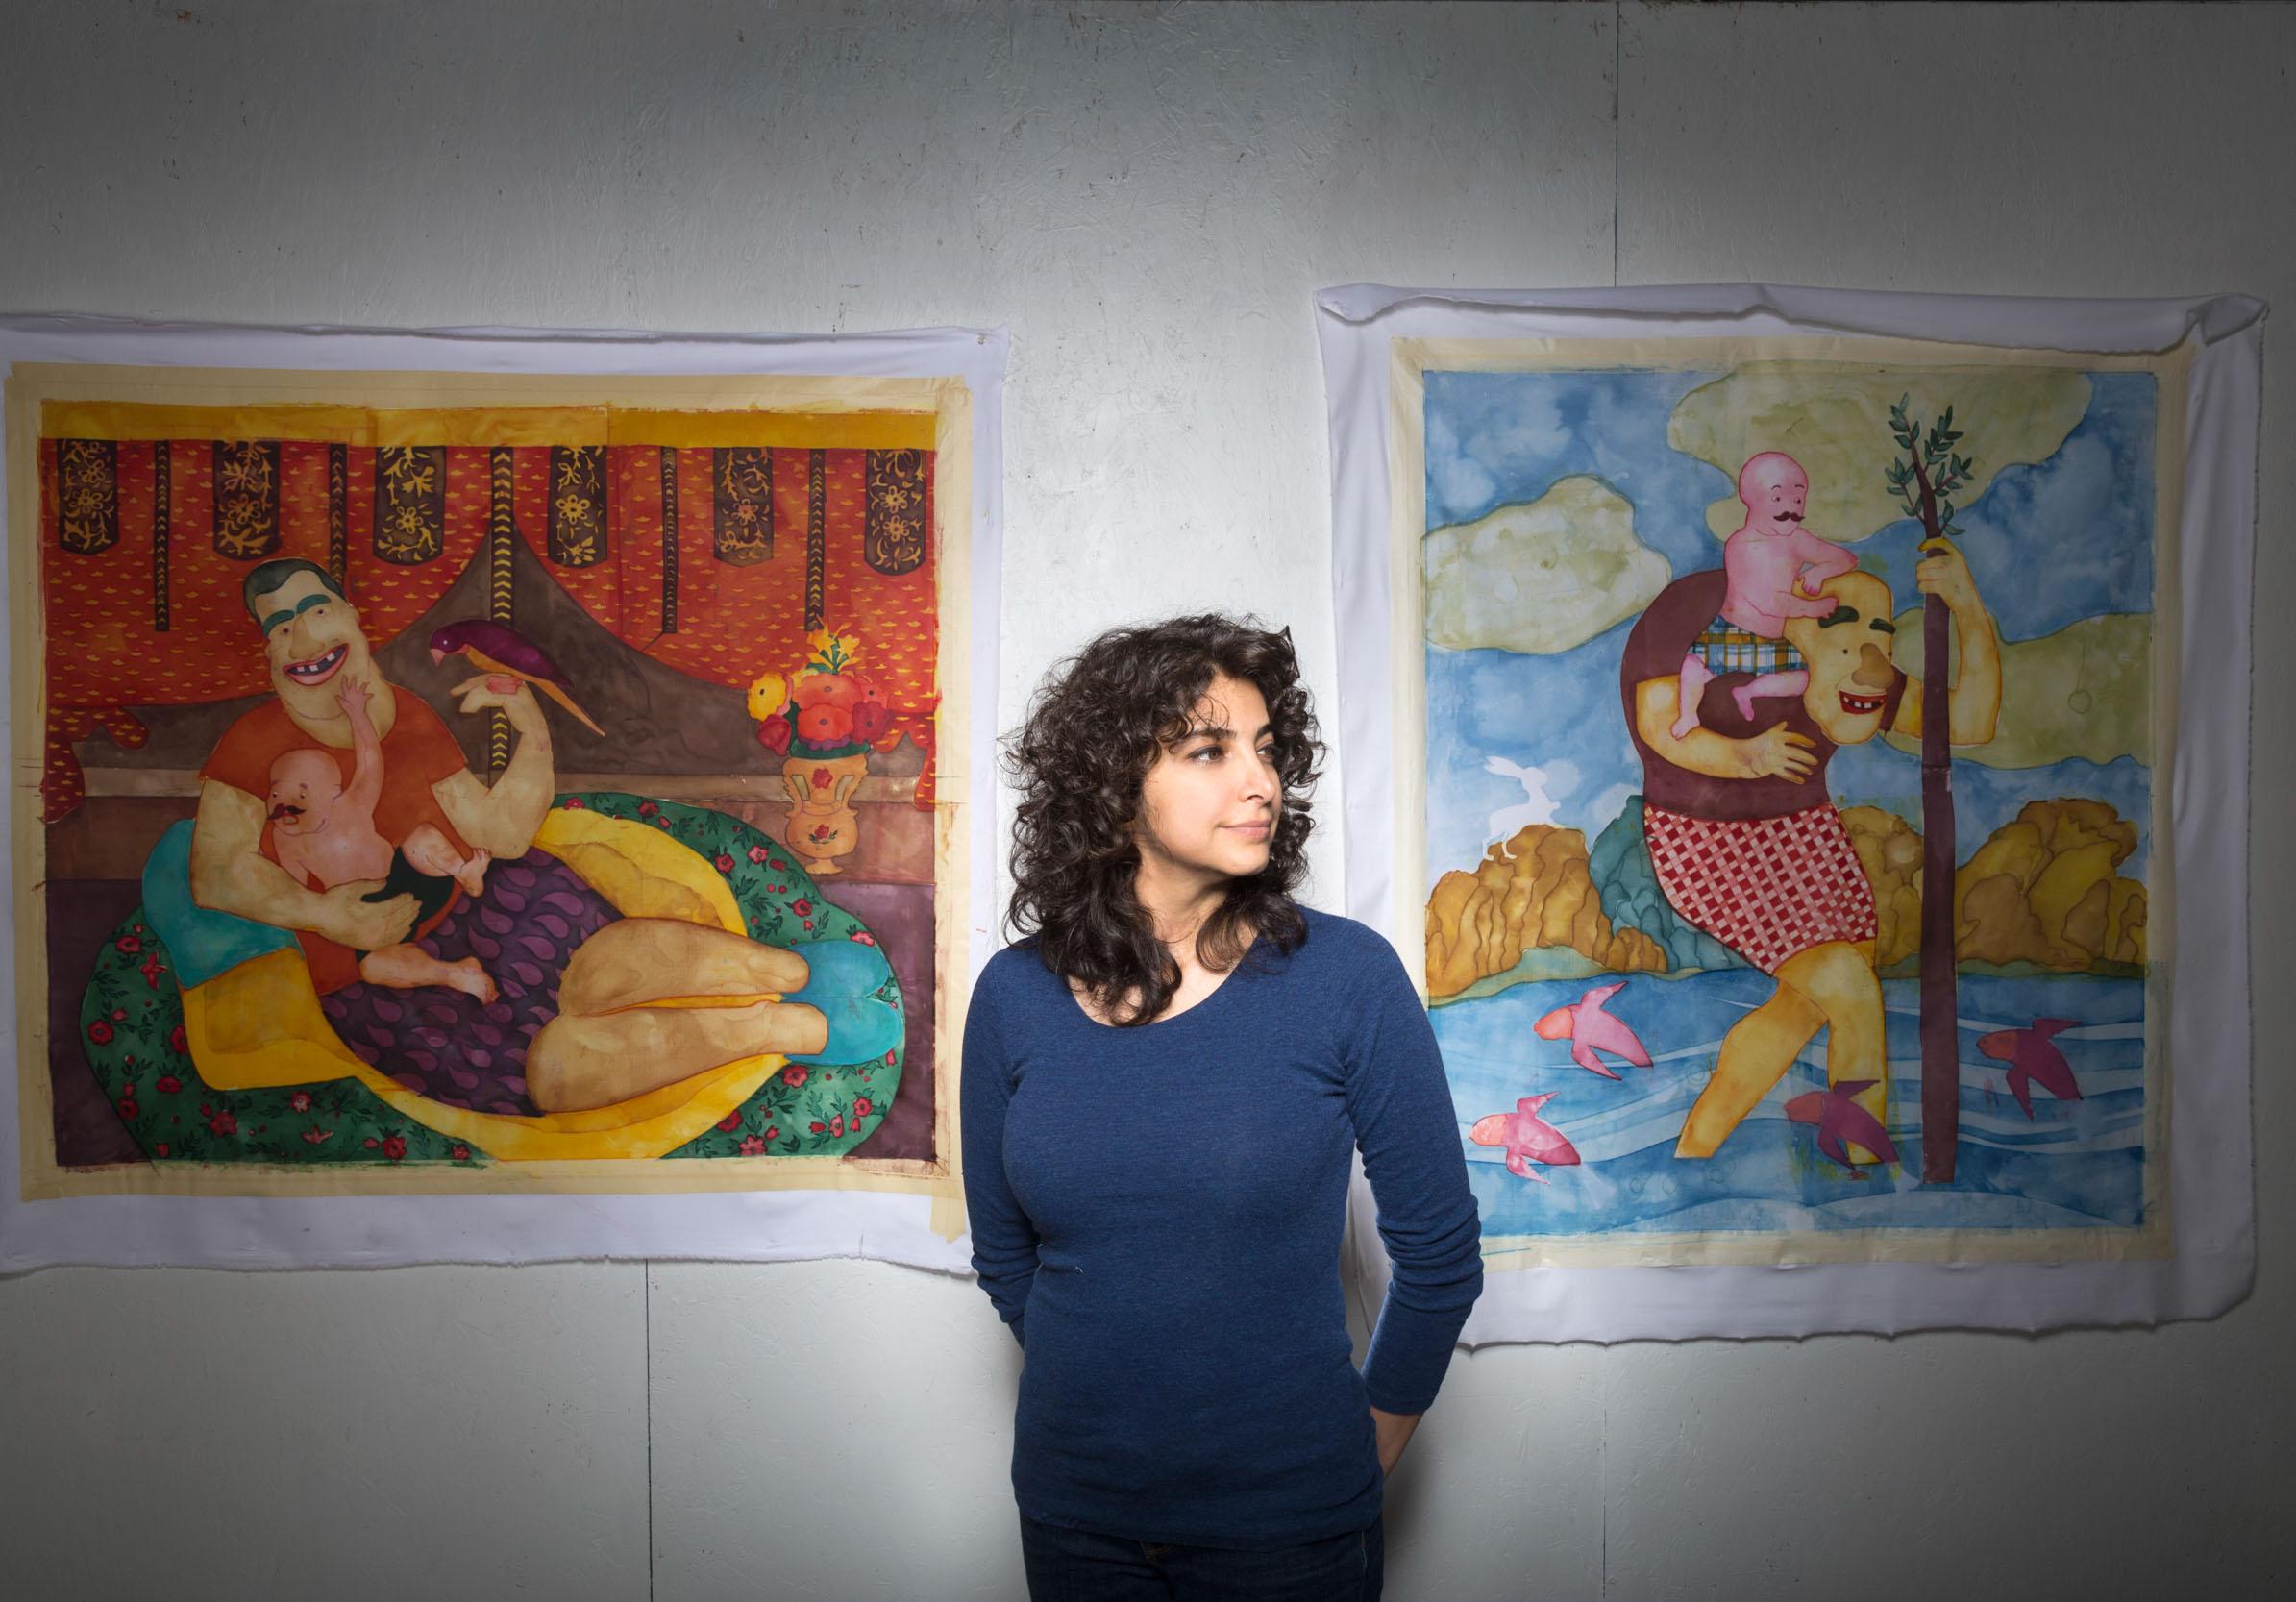 ORKIDEH TORABI - Artist-in-Residence